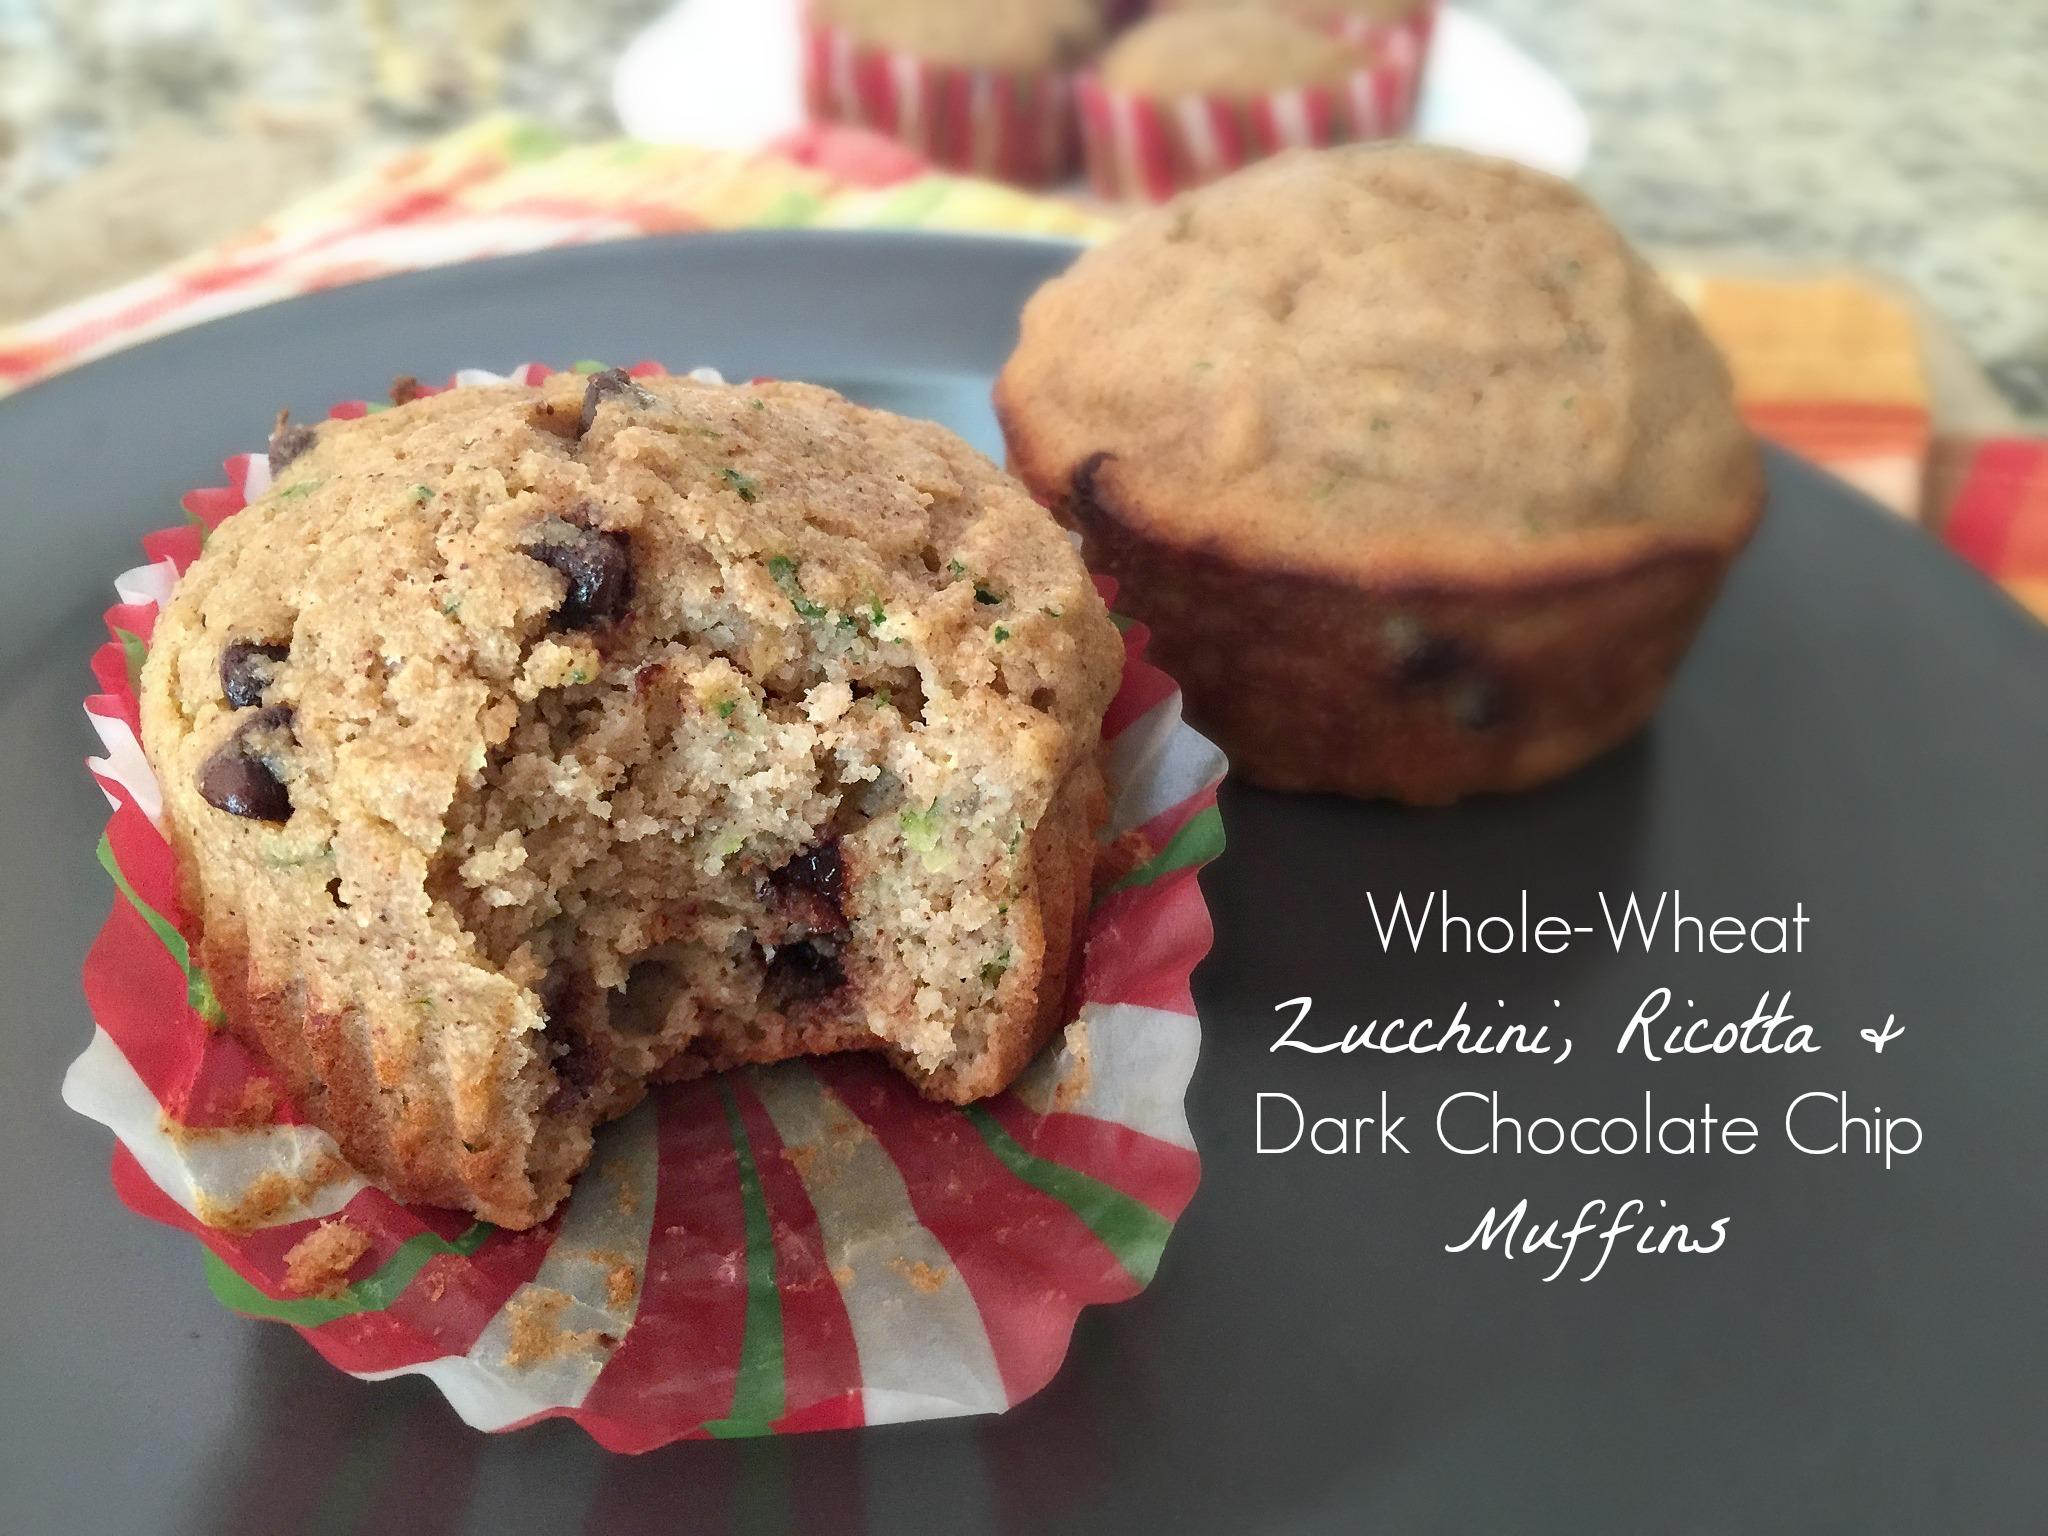 Whole Wheat Zucchini, Ricotta & Dark Chocolate Chip Muffins